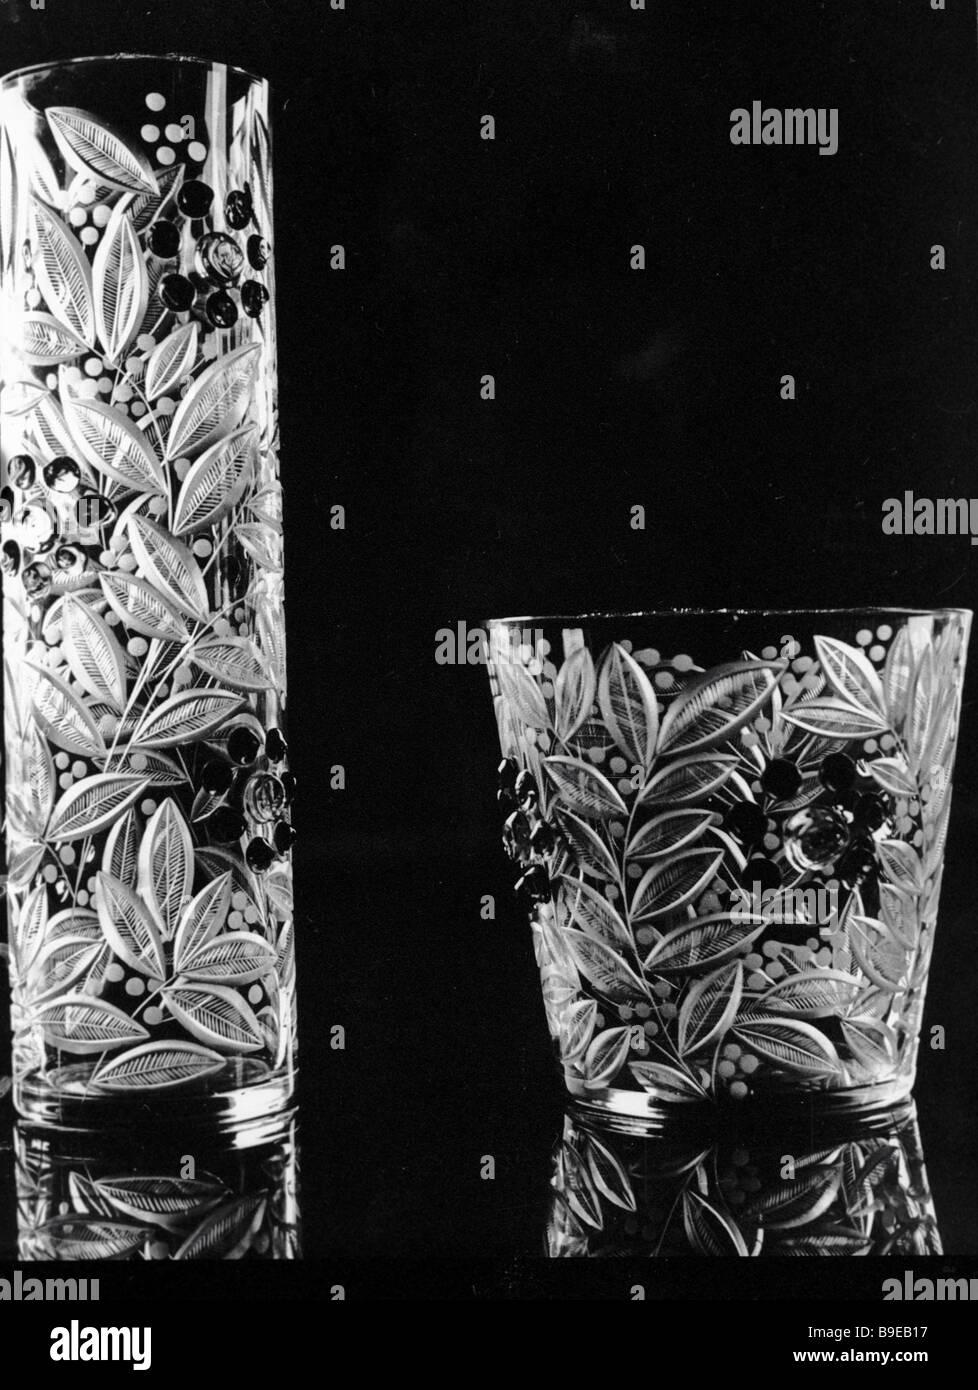 A Rowanberry set of cut glass vases Gus Khrustalny glassworks - Stock Image